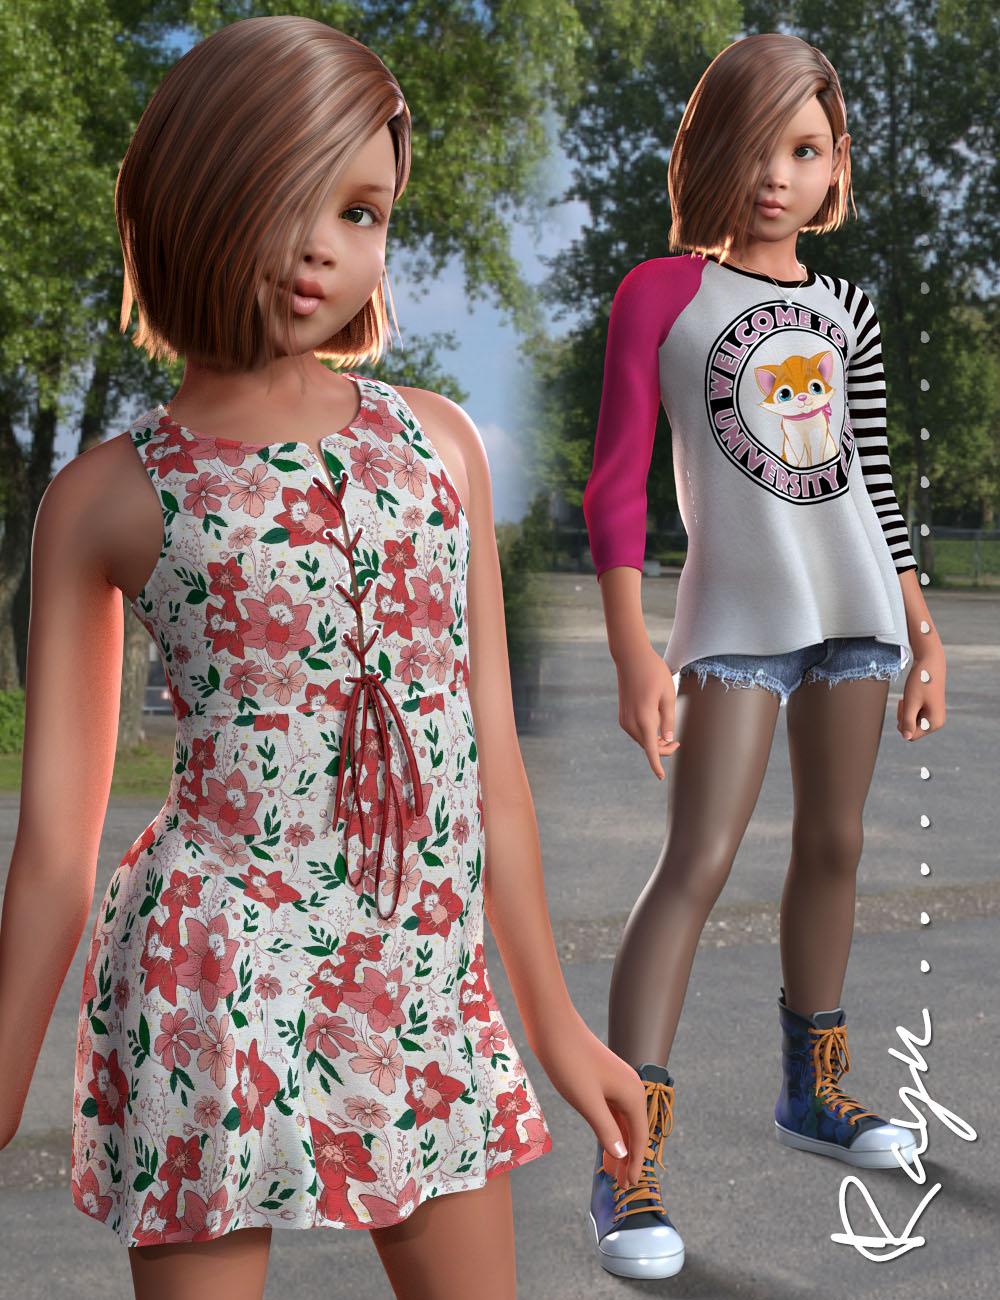 Rayn for Genesis 3 Female(s) Bundle by: 3D Universe, 3D Models by Daz 3D